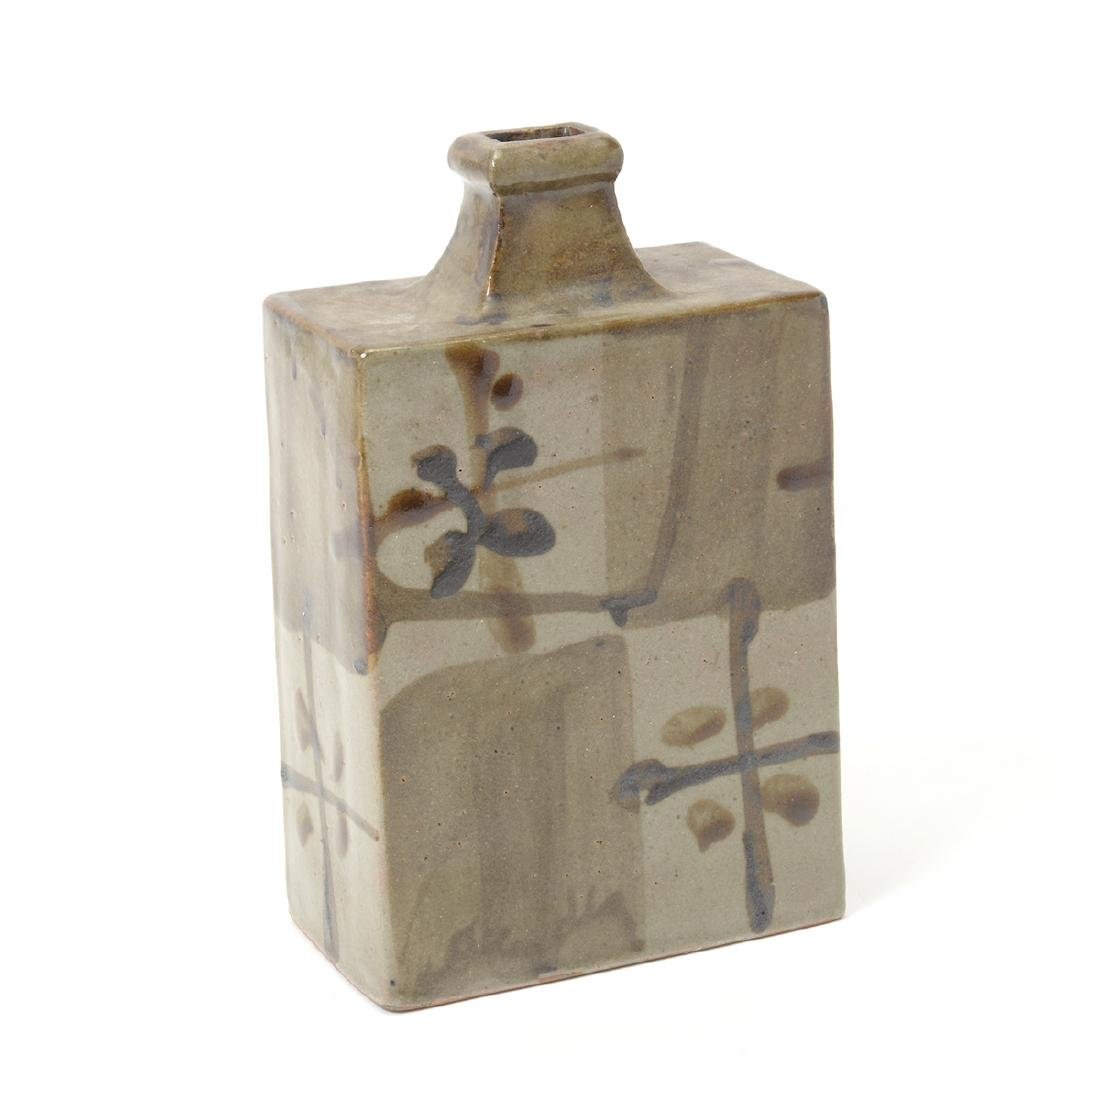 Japanese Glazed Ceramic Square Bottle Vase